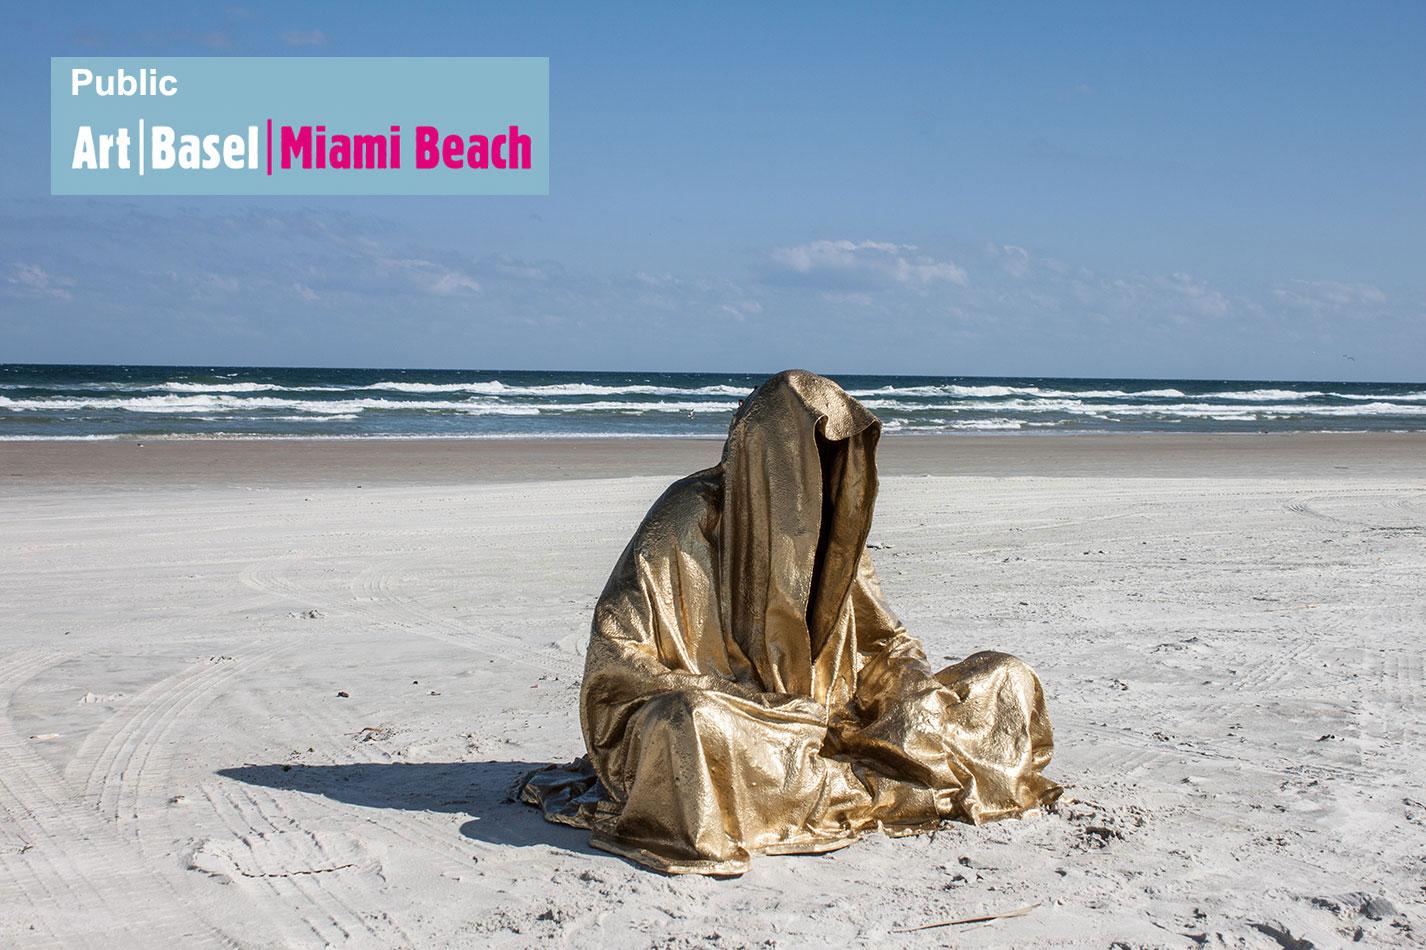 art-basel-miami-beach-fair-usa-florida-usa-guardians-of-time-manfred-kili-kielnhofer-contemporary-fine-art-modern-arts-design-antiques-sculpture-5120